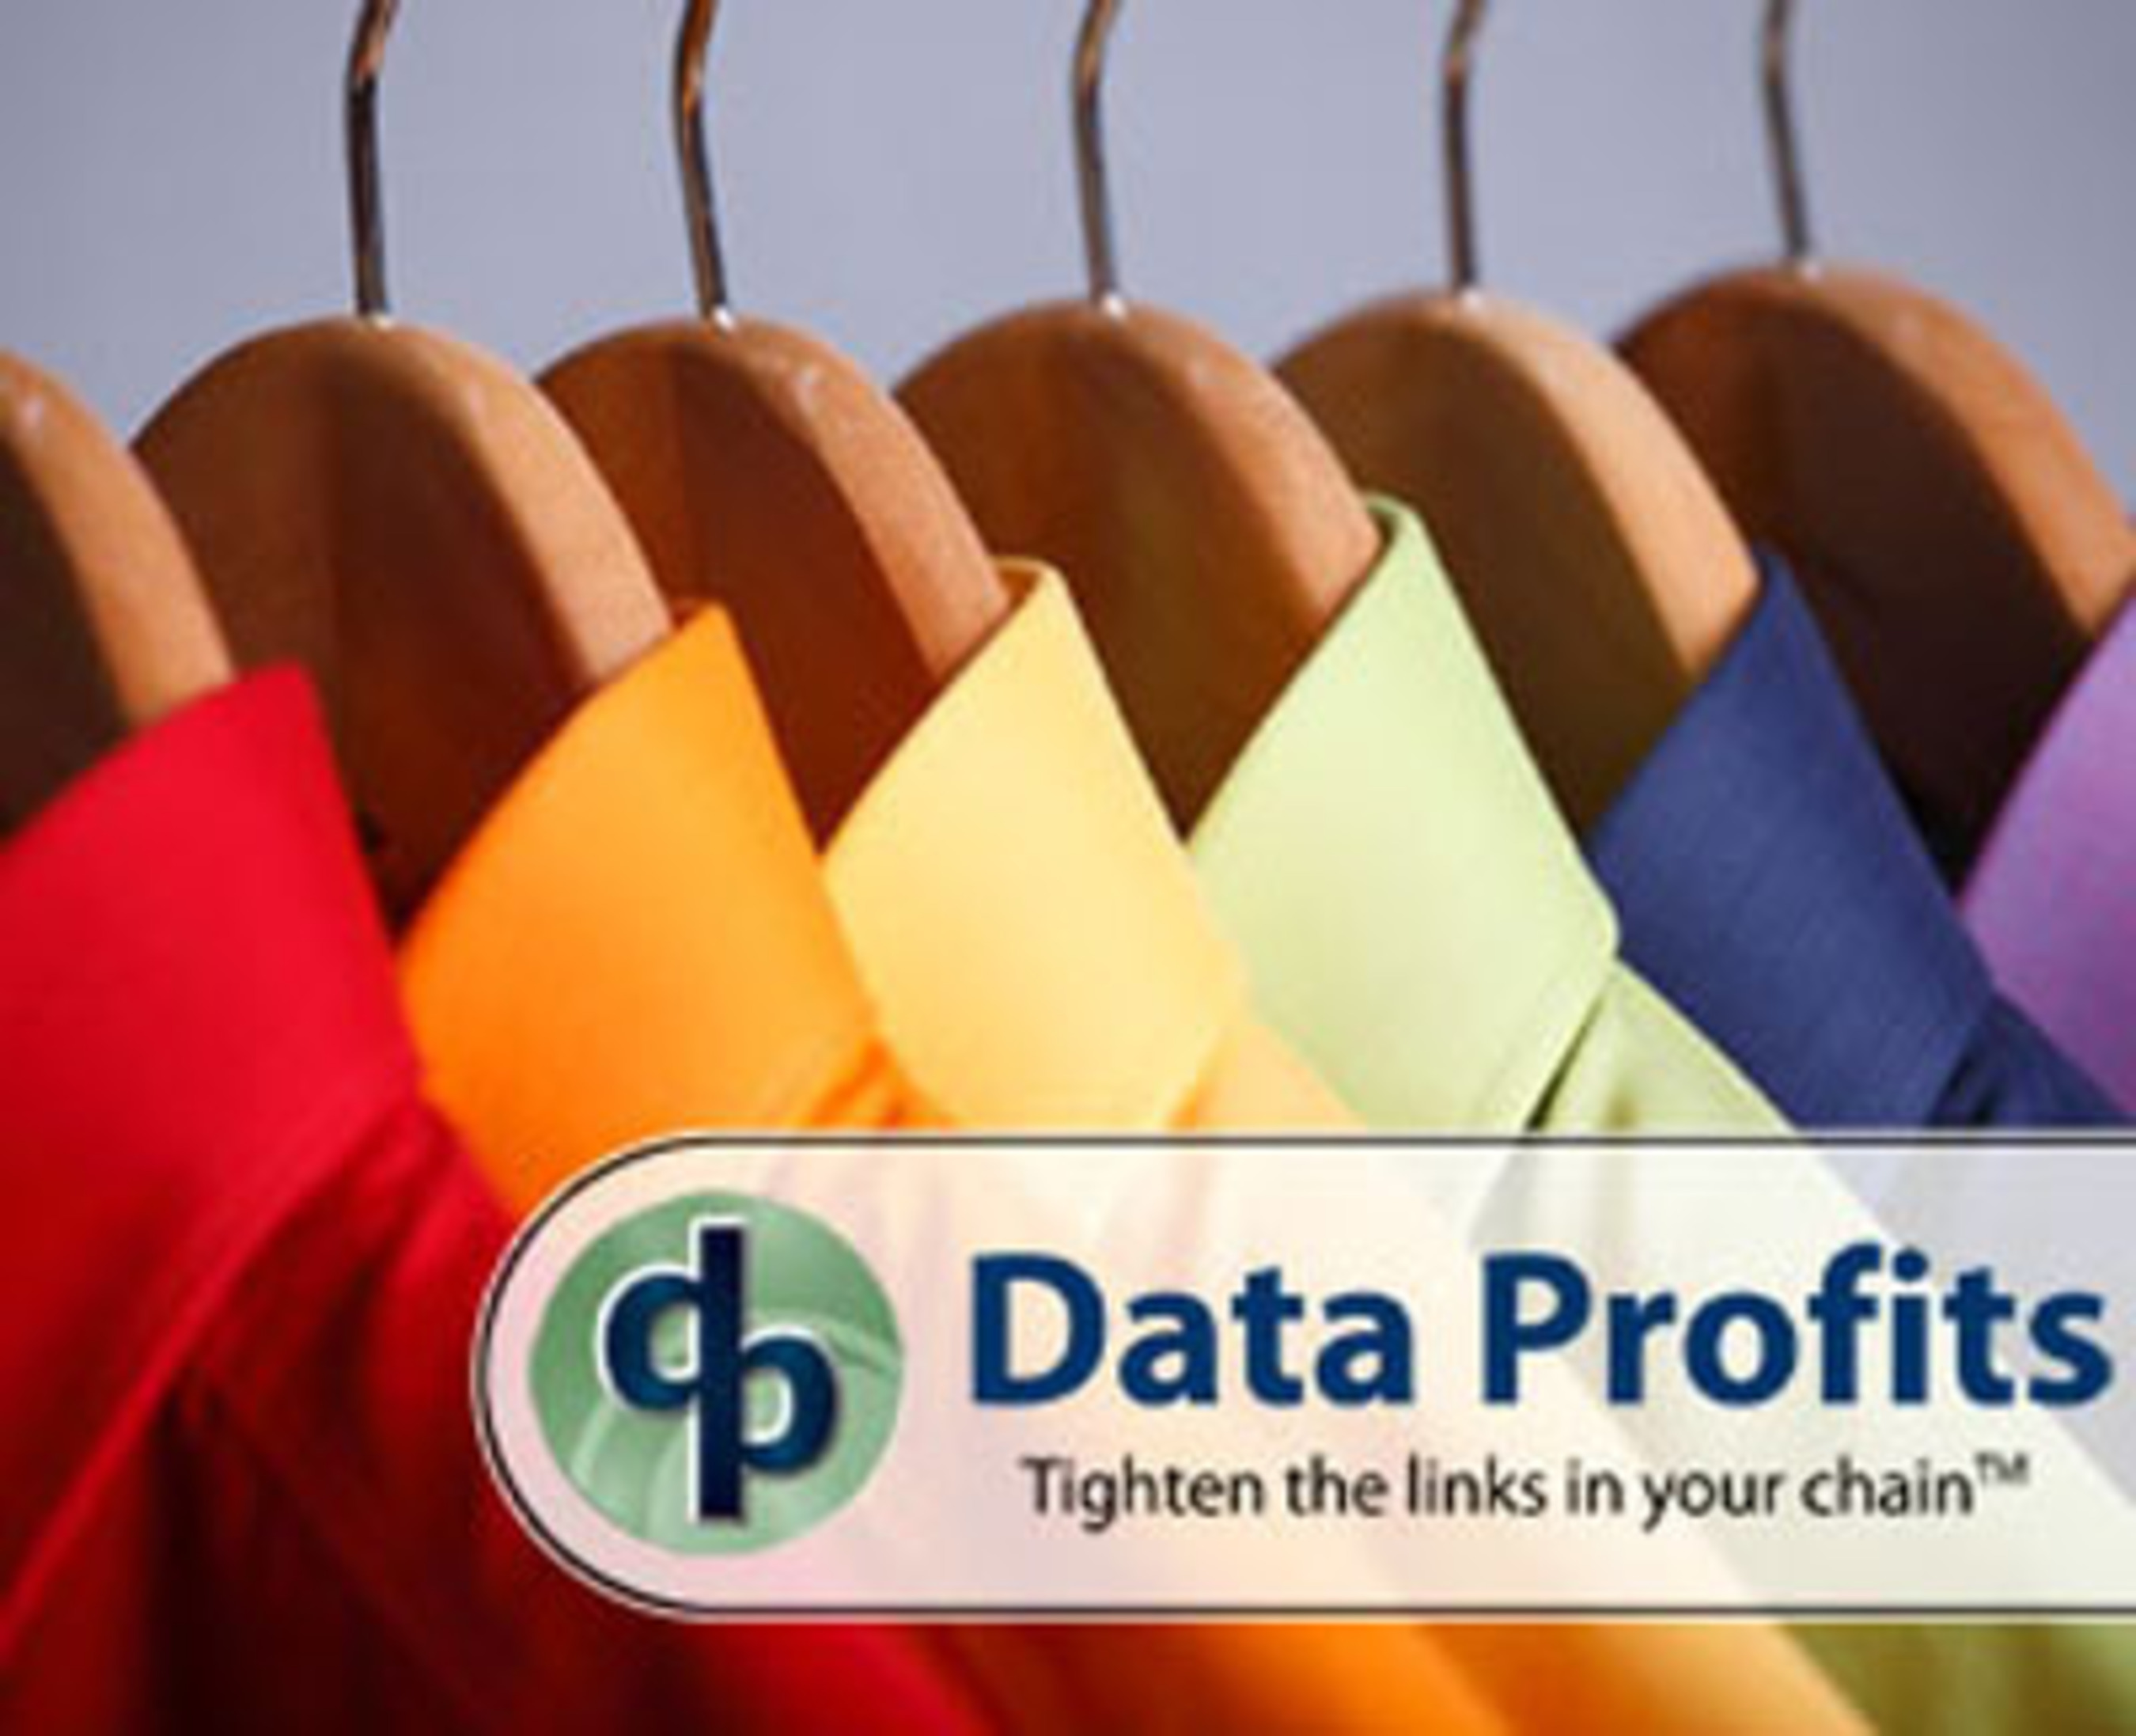 Data Profits supply chain visibility.  (PRNewsFoto/Data Profits Inc.)